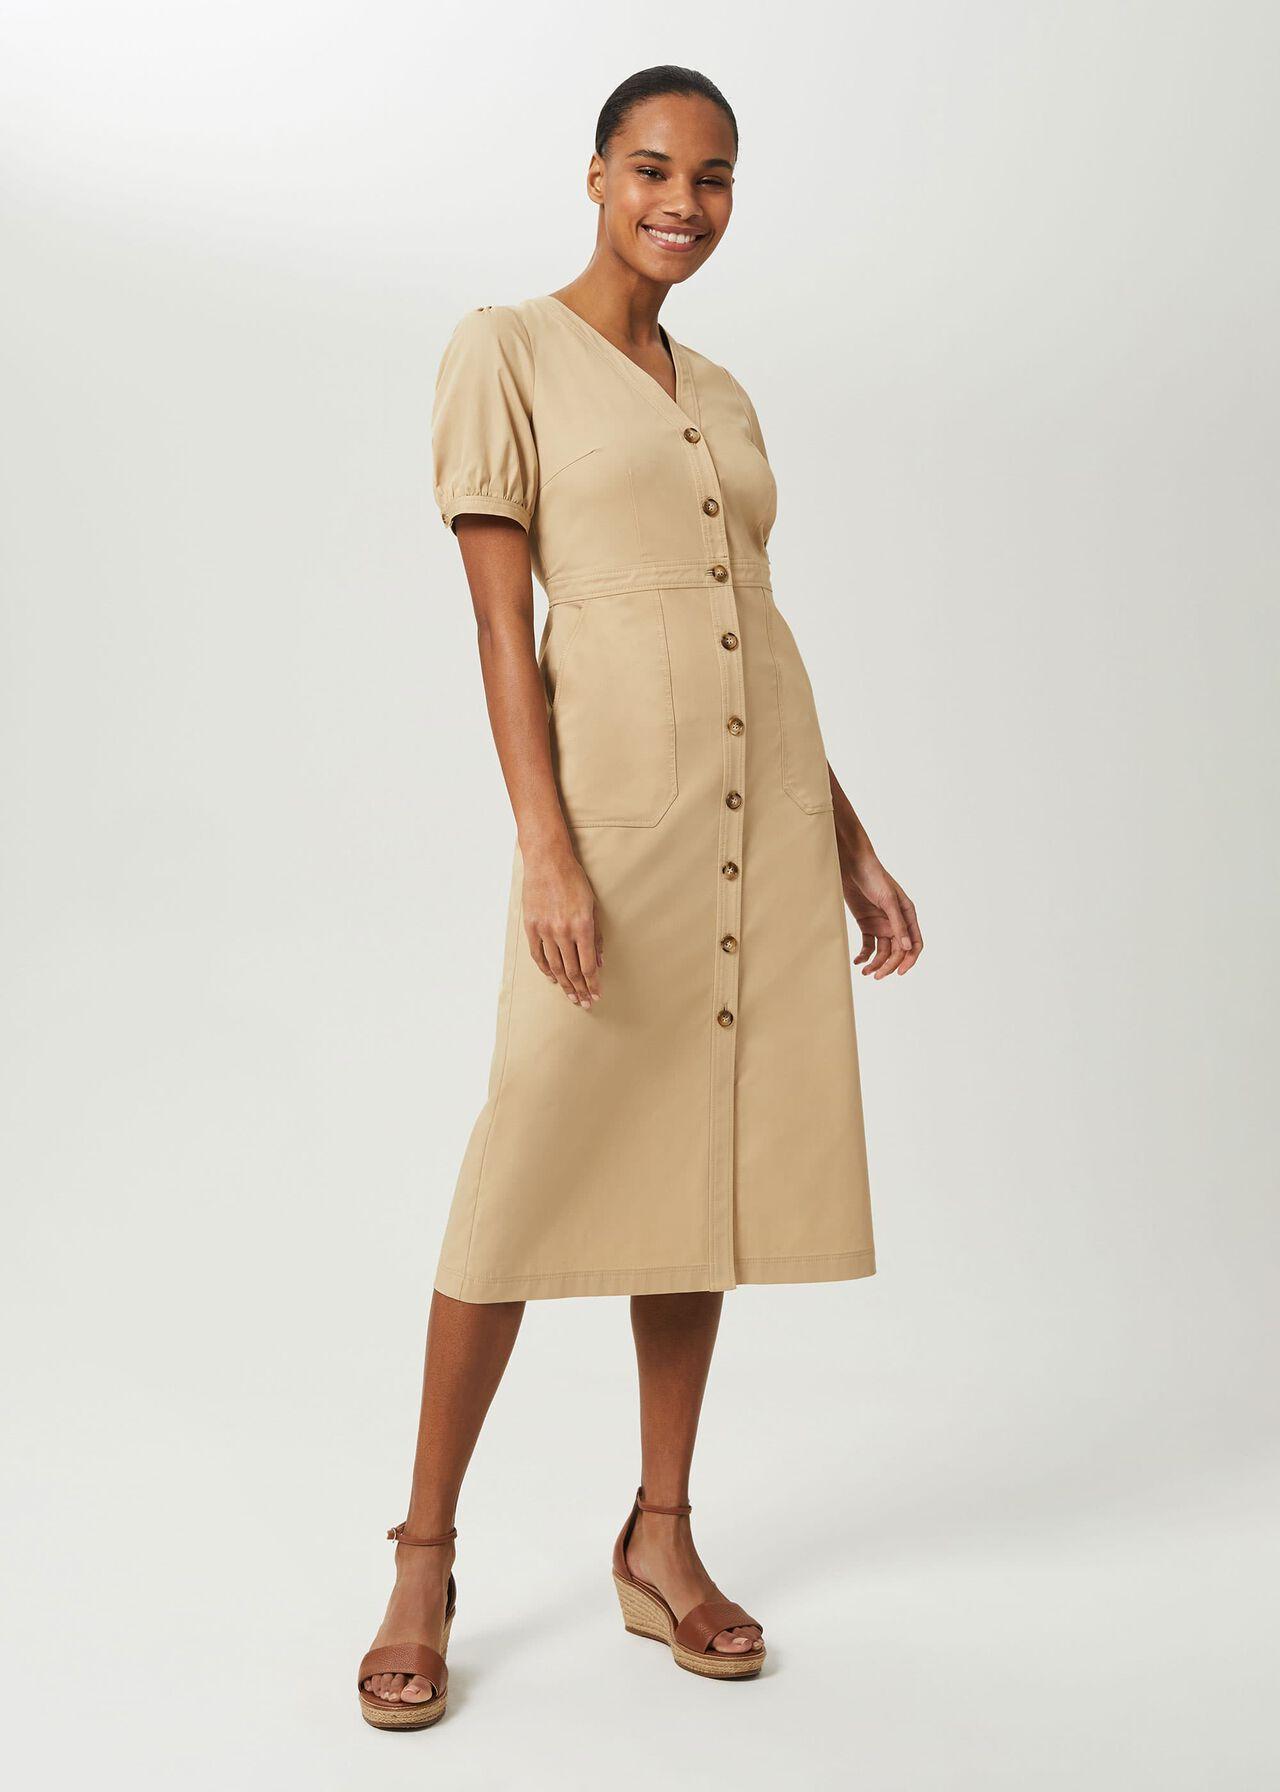 Adaline V Neck Midi Dress, Sand, hi-res